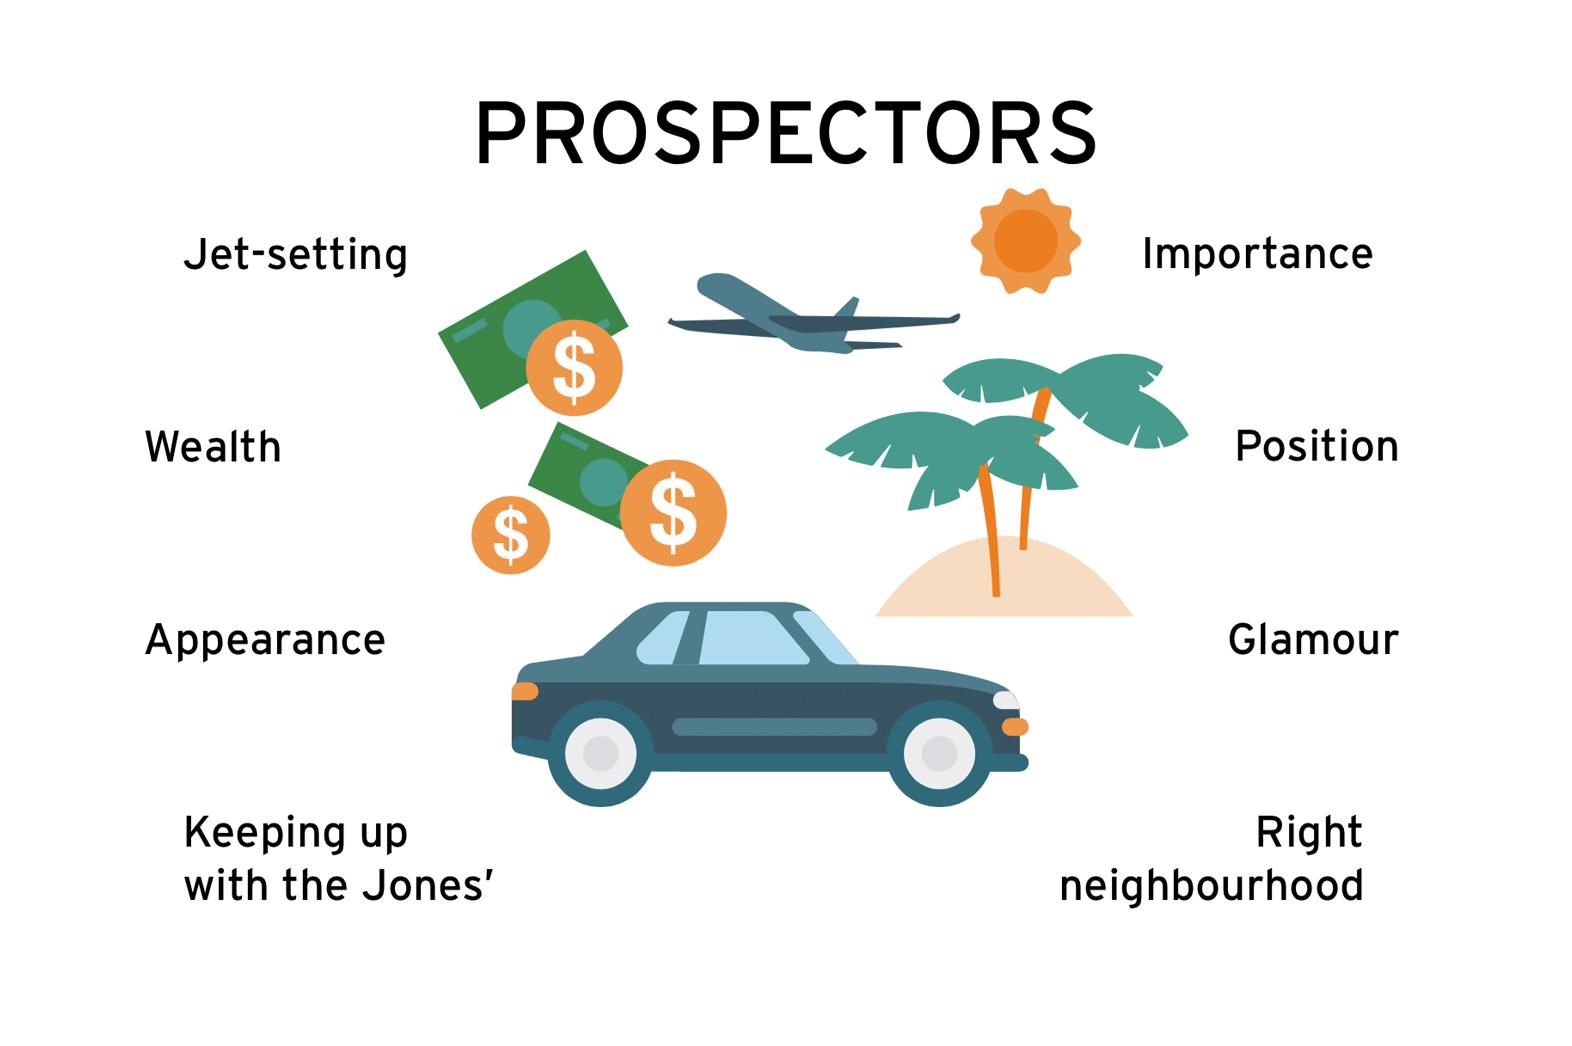 Image - Prospectors